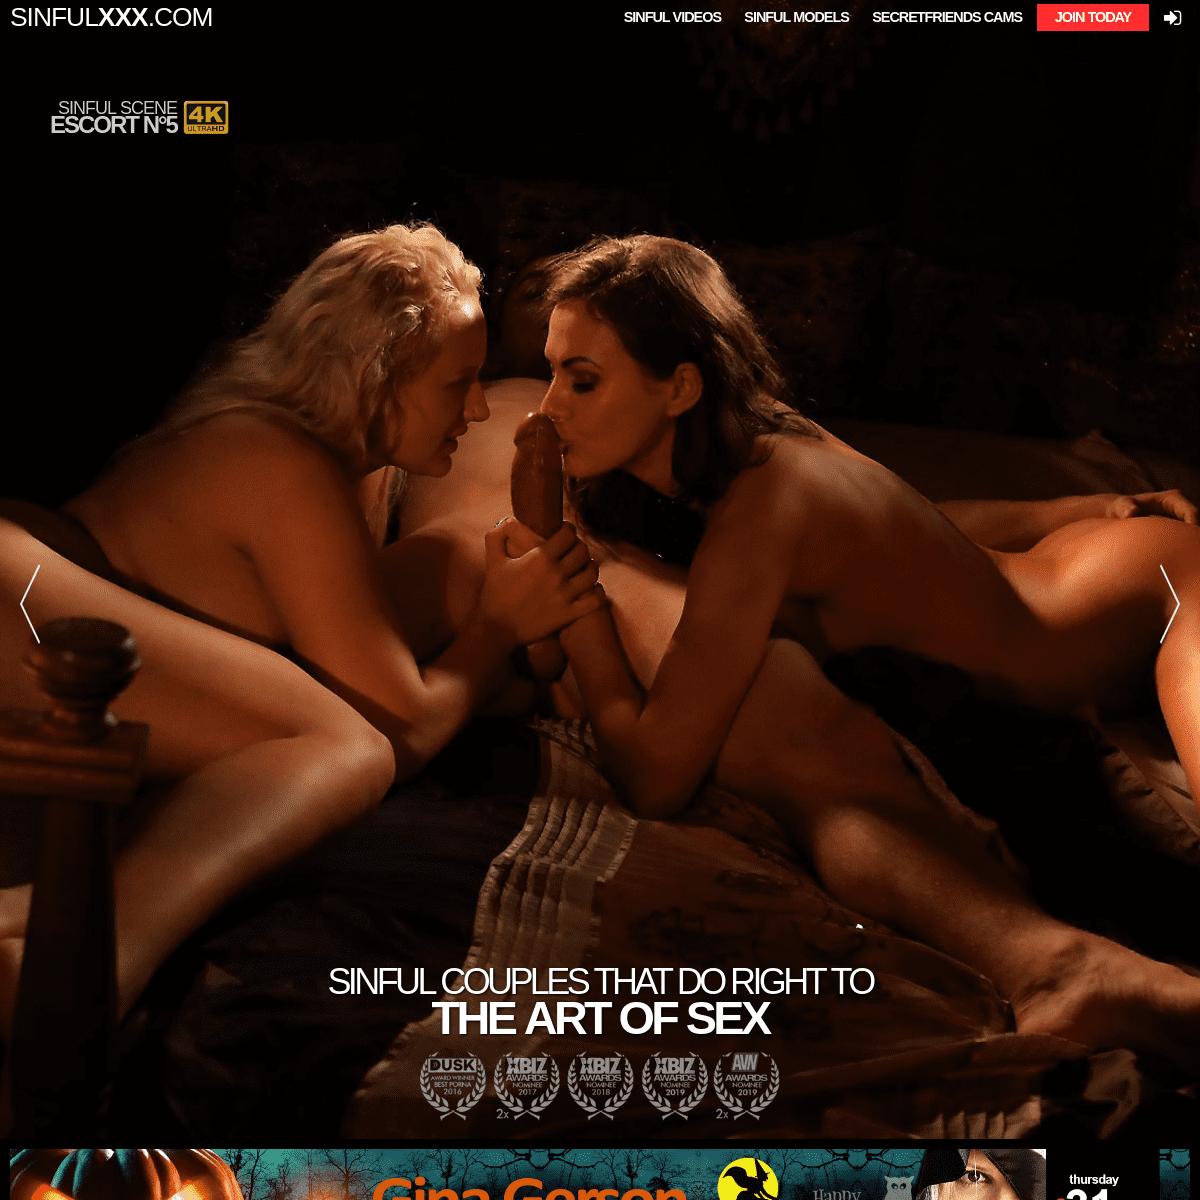 SinfulXXX.com Female and Couple Friendly Porn!